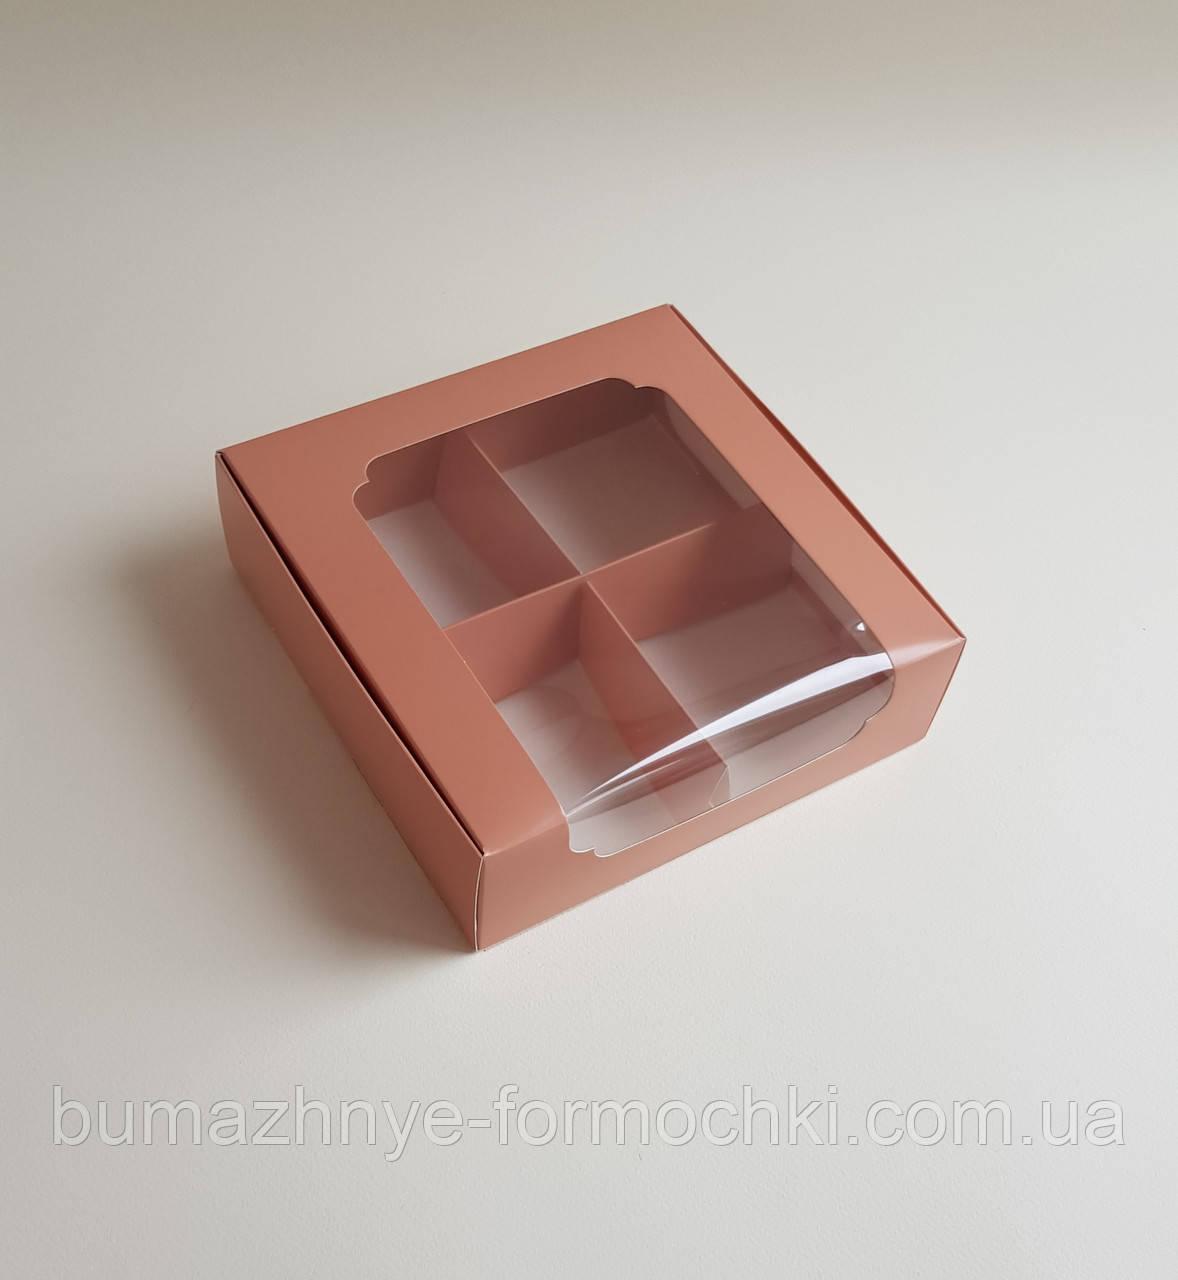 Коробка для десертов, 200*200*60, капучино